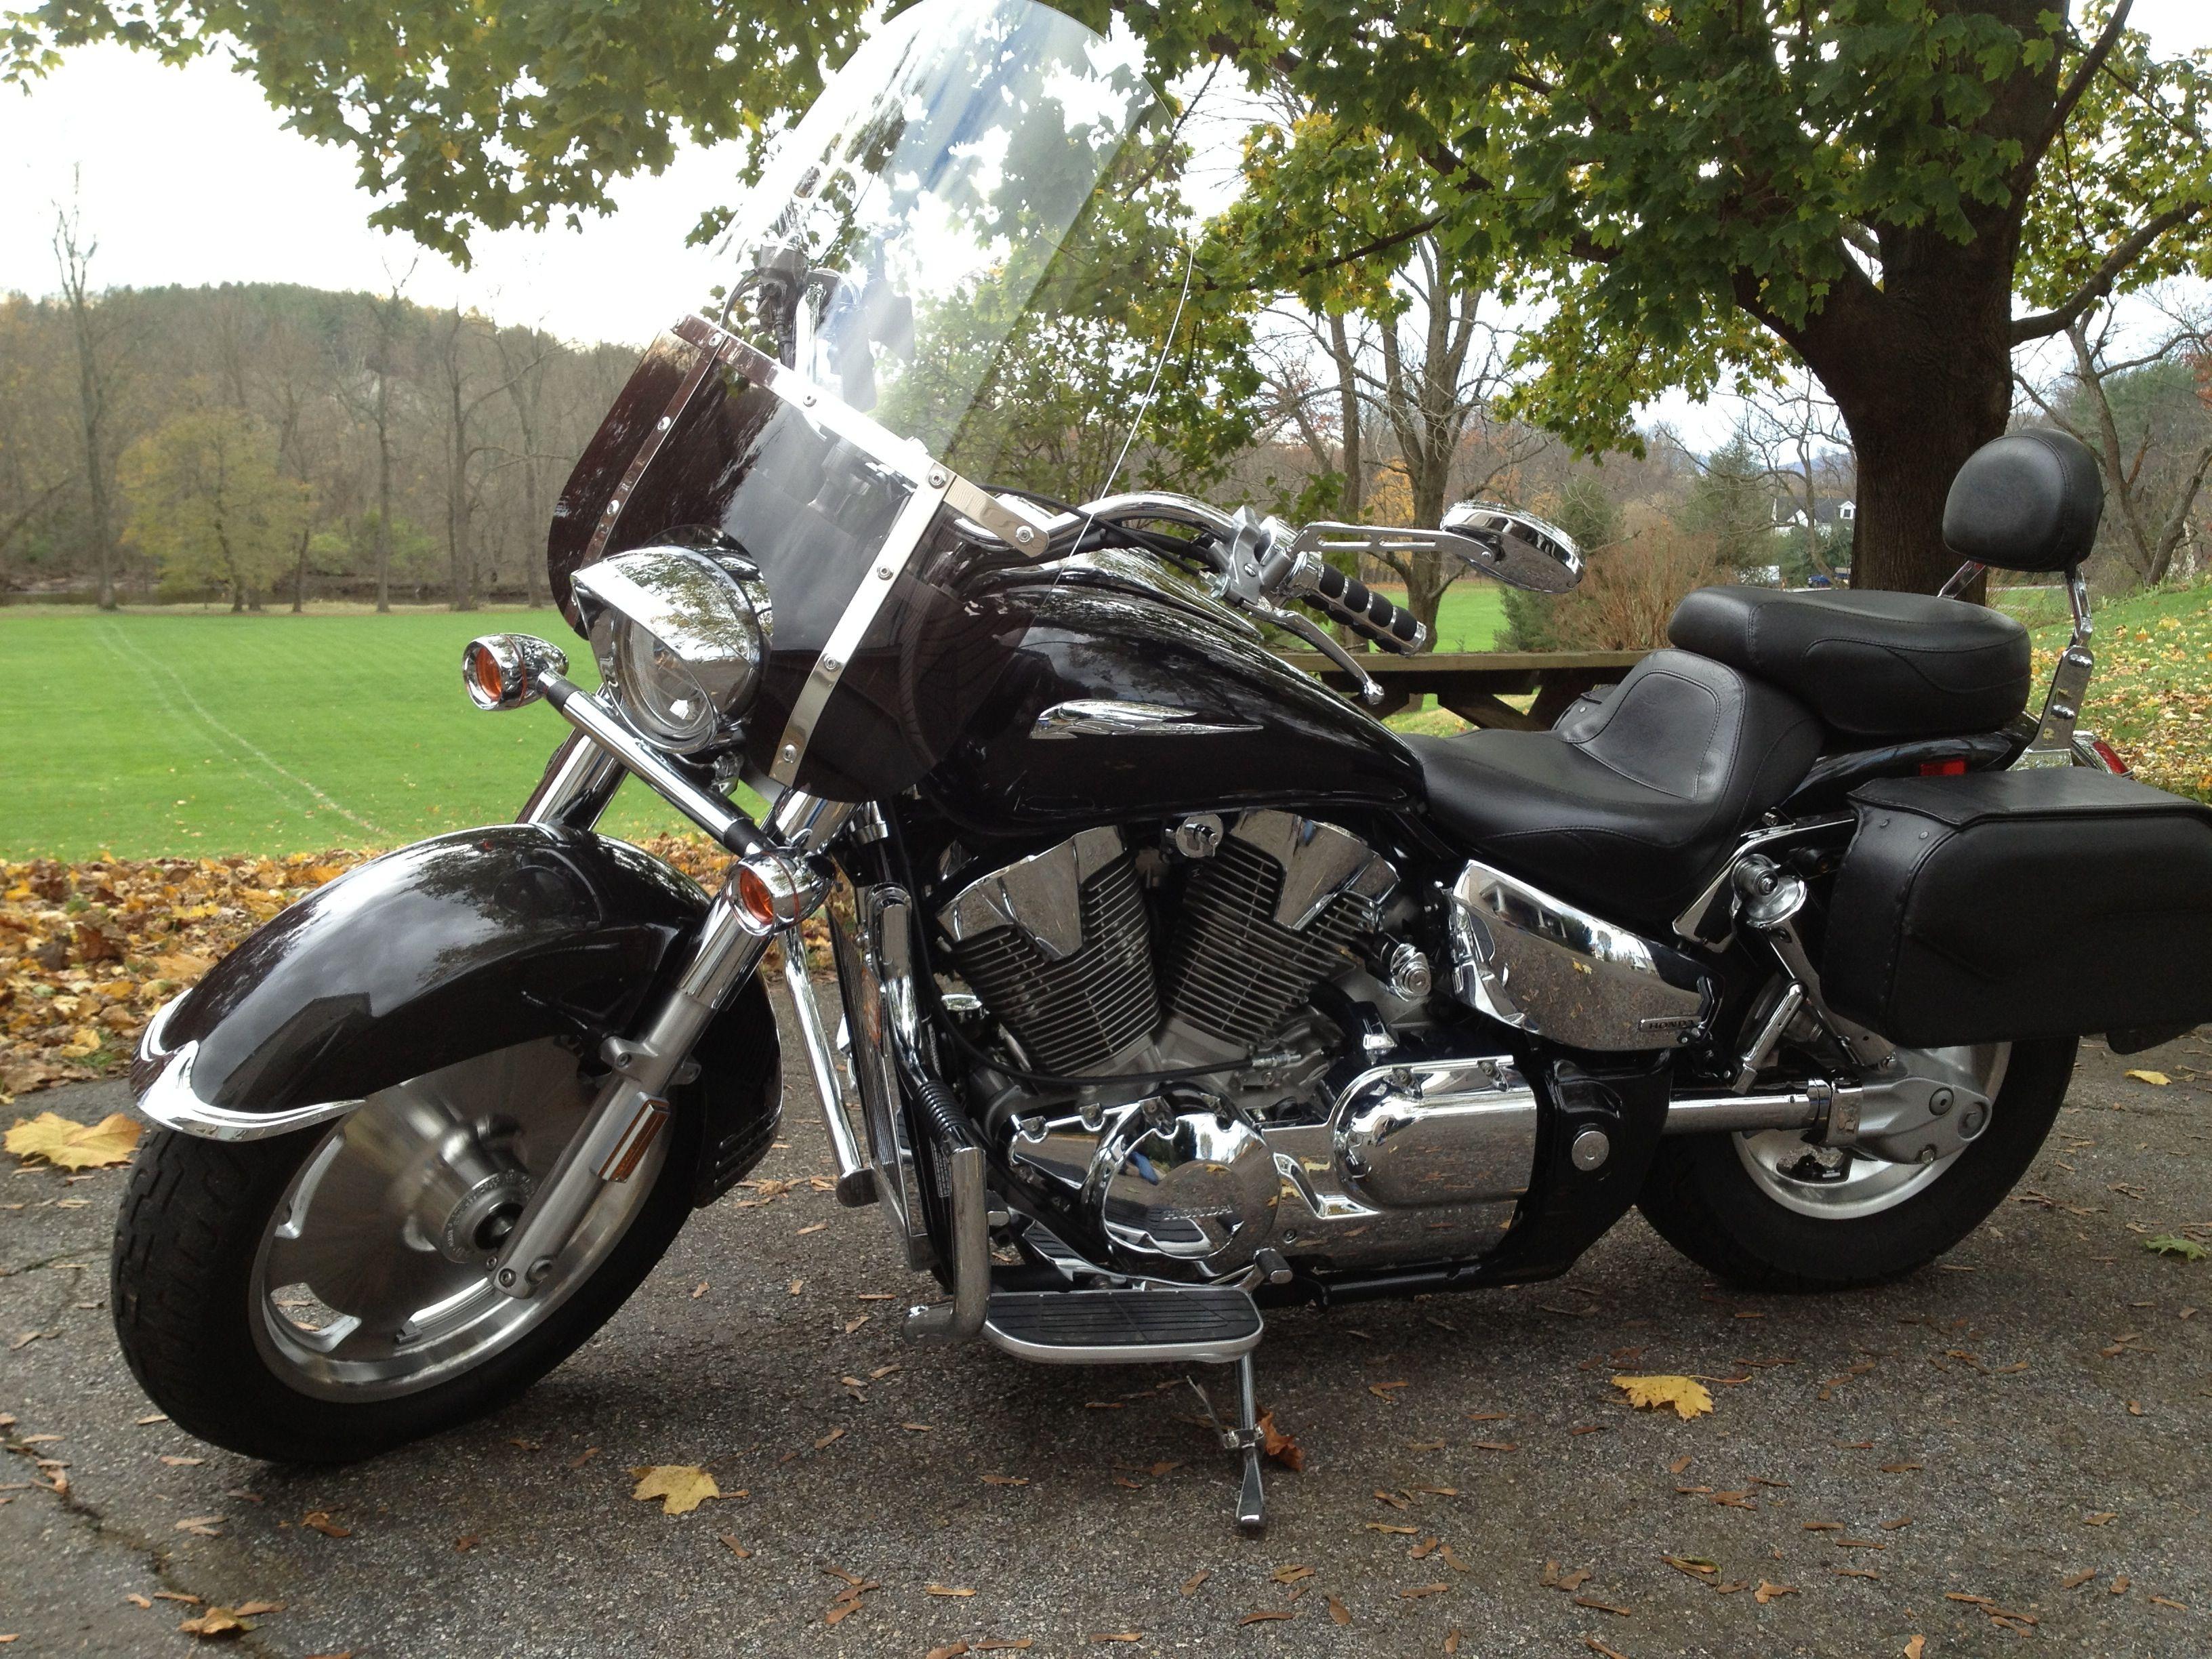 medium resolution of  the other woman my 2009 honda vtx 1300r street motorcycles honda motorcycles